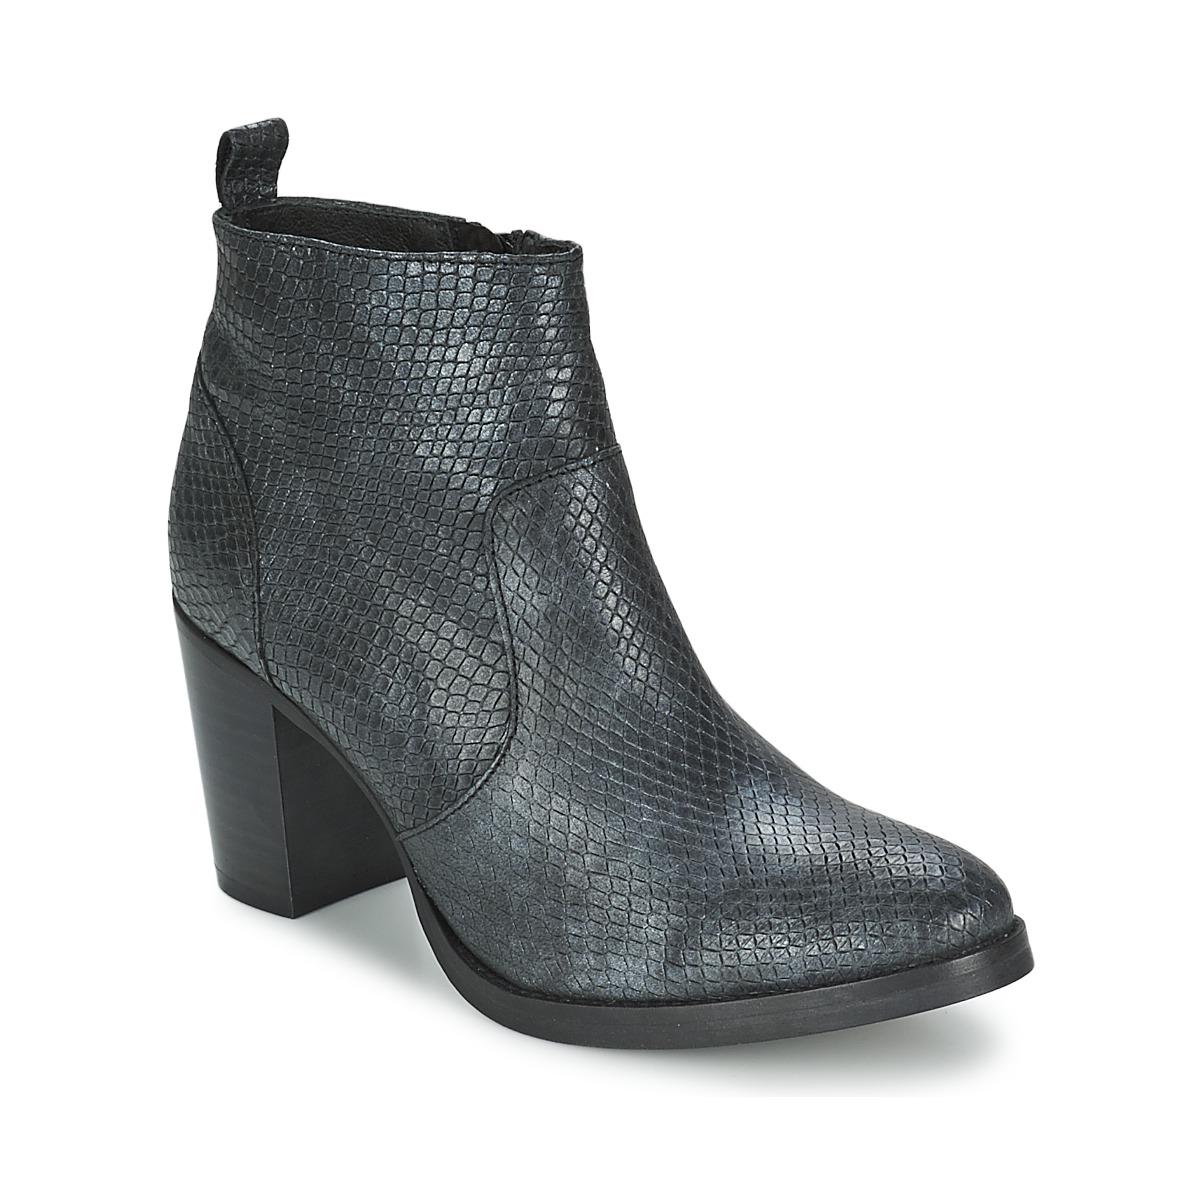 Betty London ISSOR Schwarz - Kostenloser Versand bei Spartoode ! - Schuhe Low Boots Damen 62,50 €